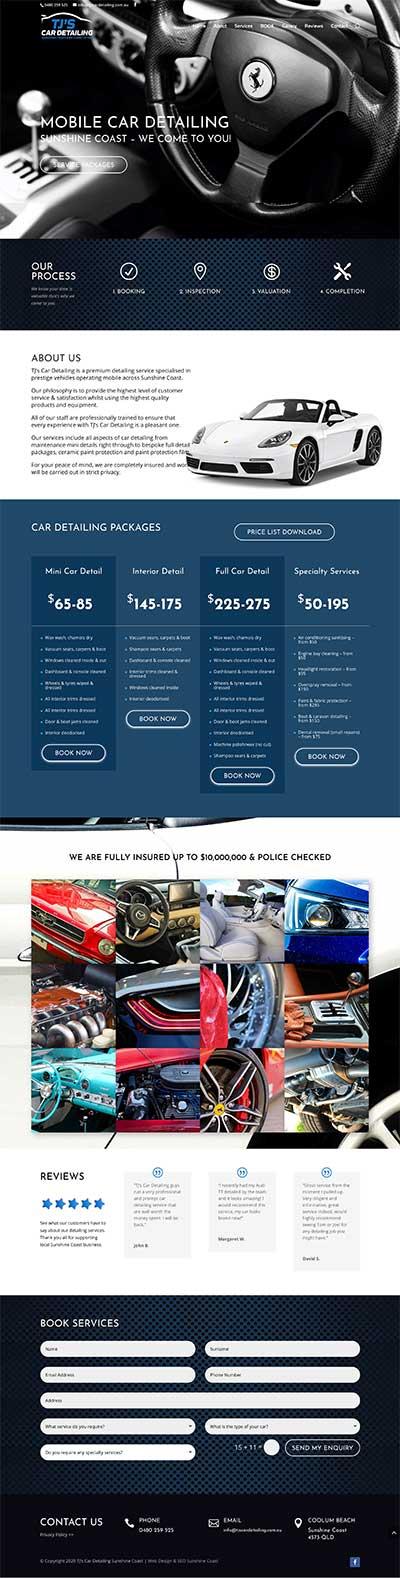 Car Detailing Web Design Sunshine Coast